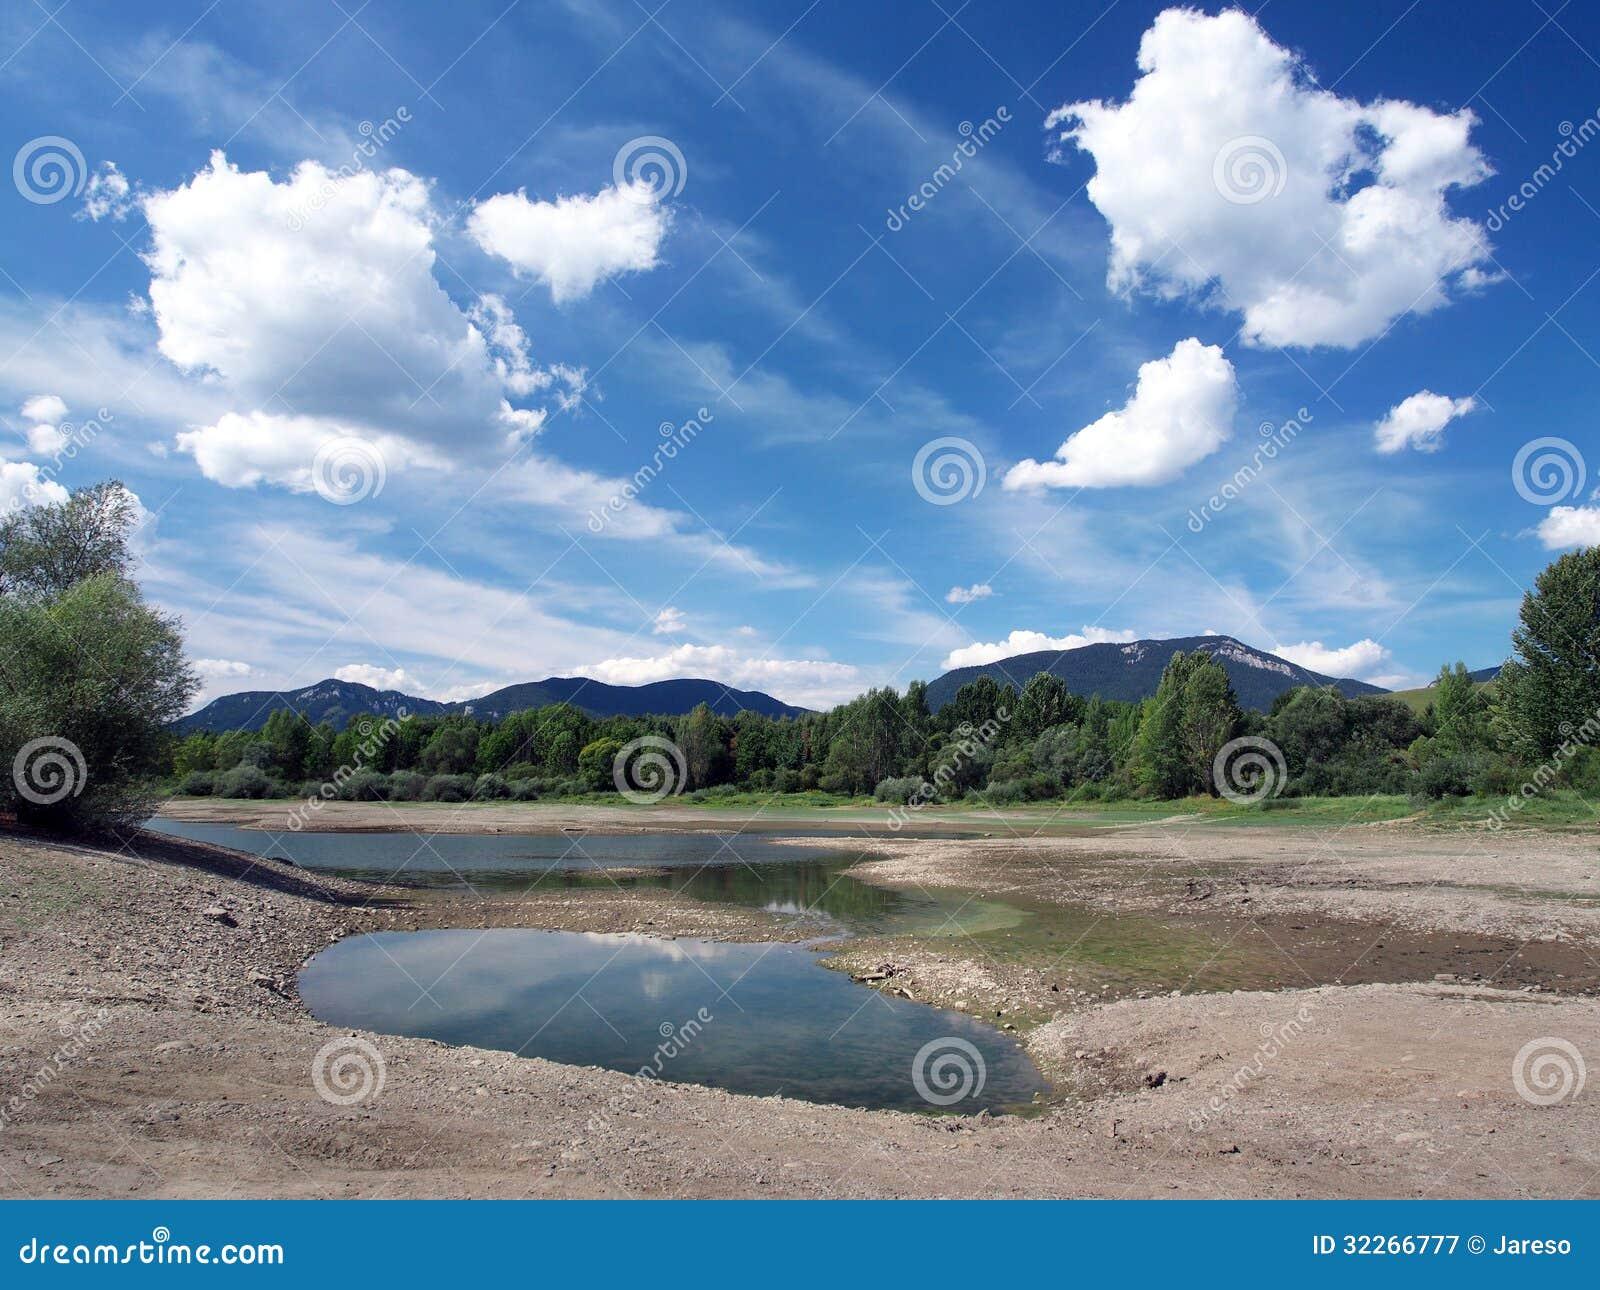 Dry shore in summer